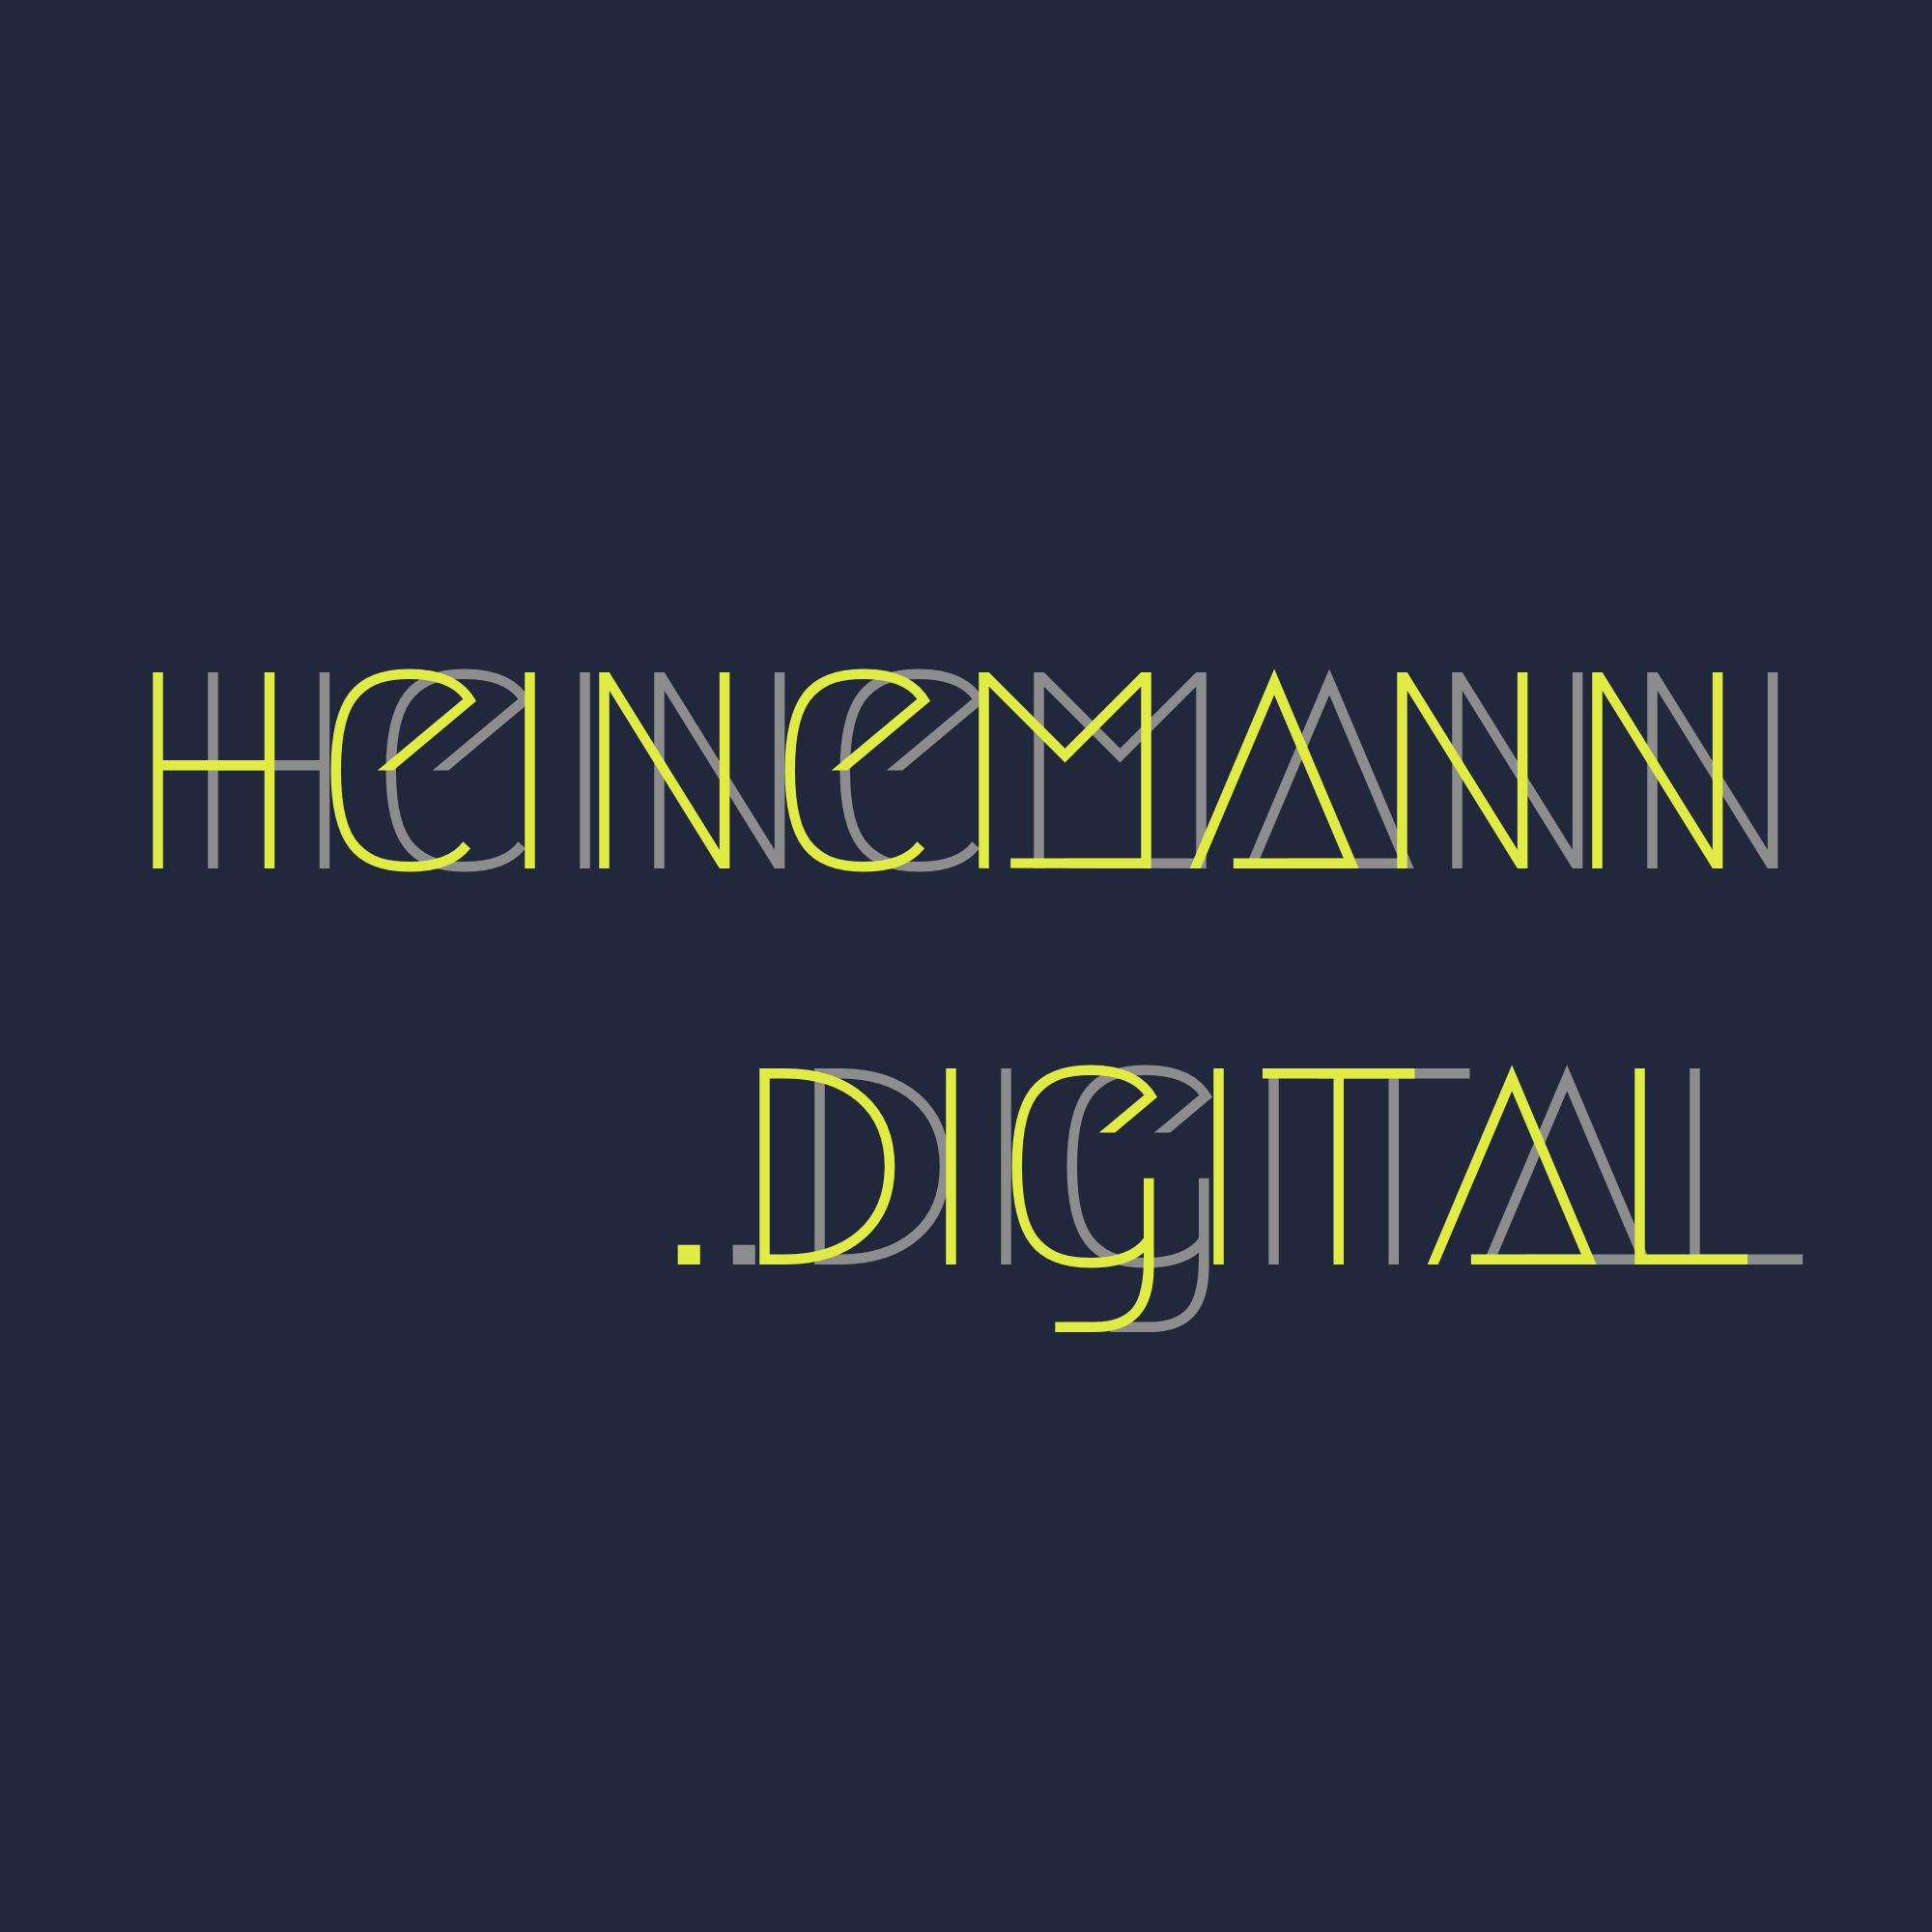 Head of Digital Marketing | Strategie, Konzeption, Beratung